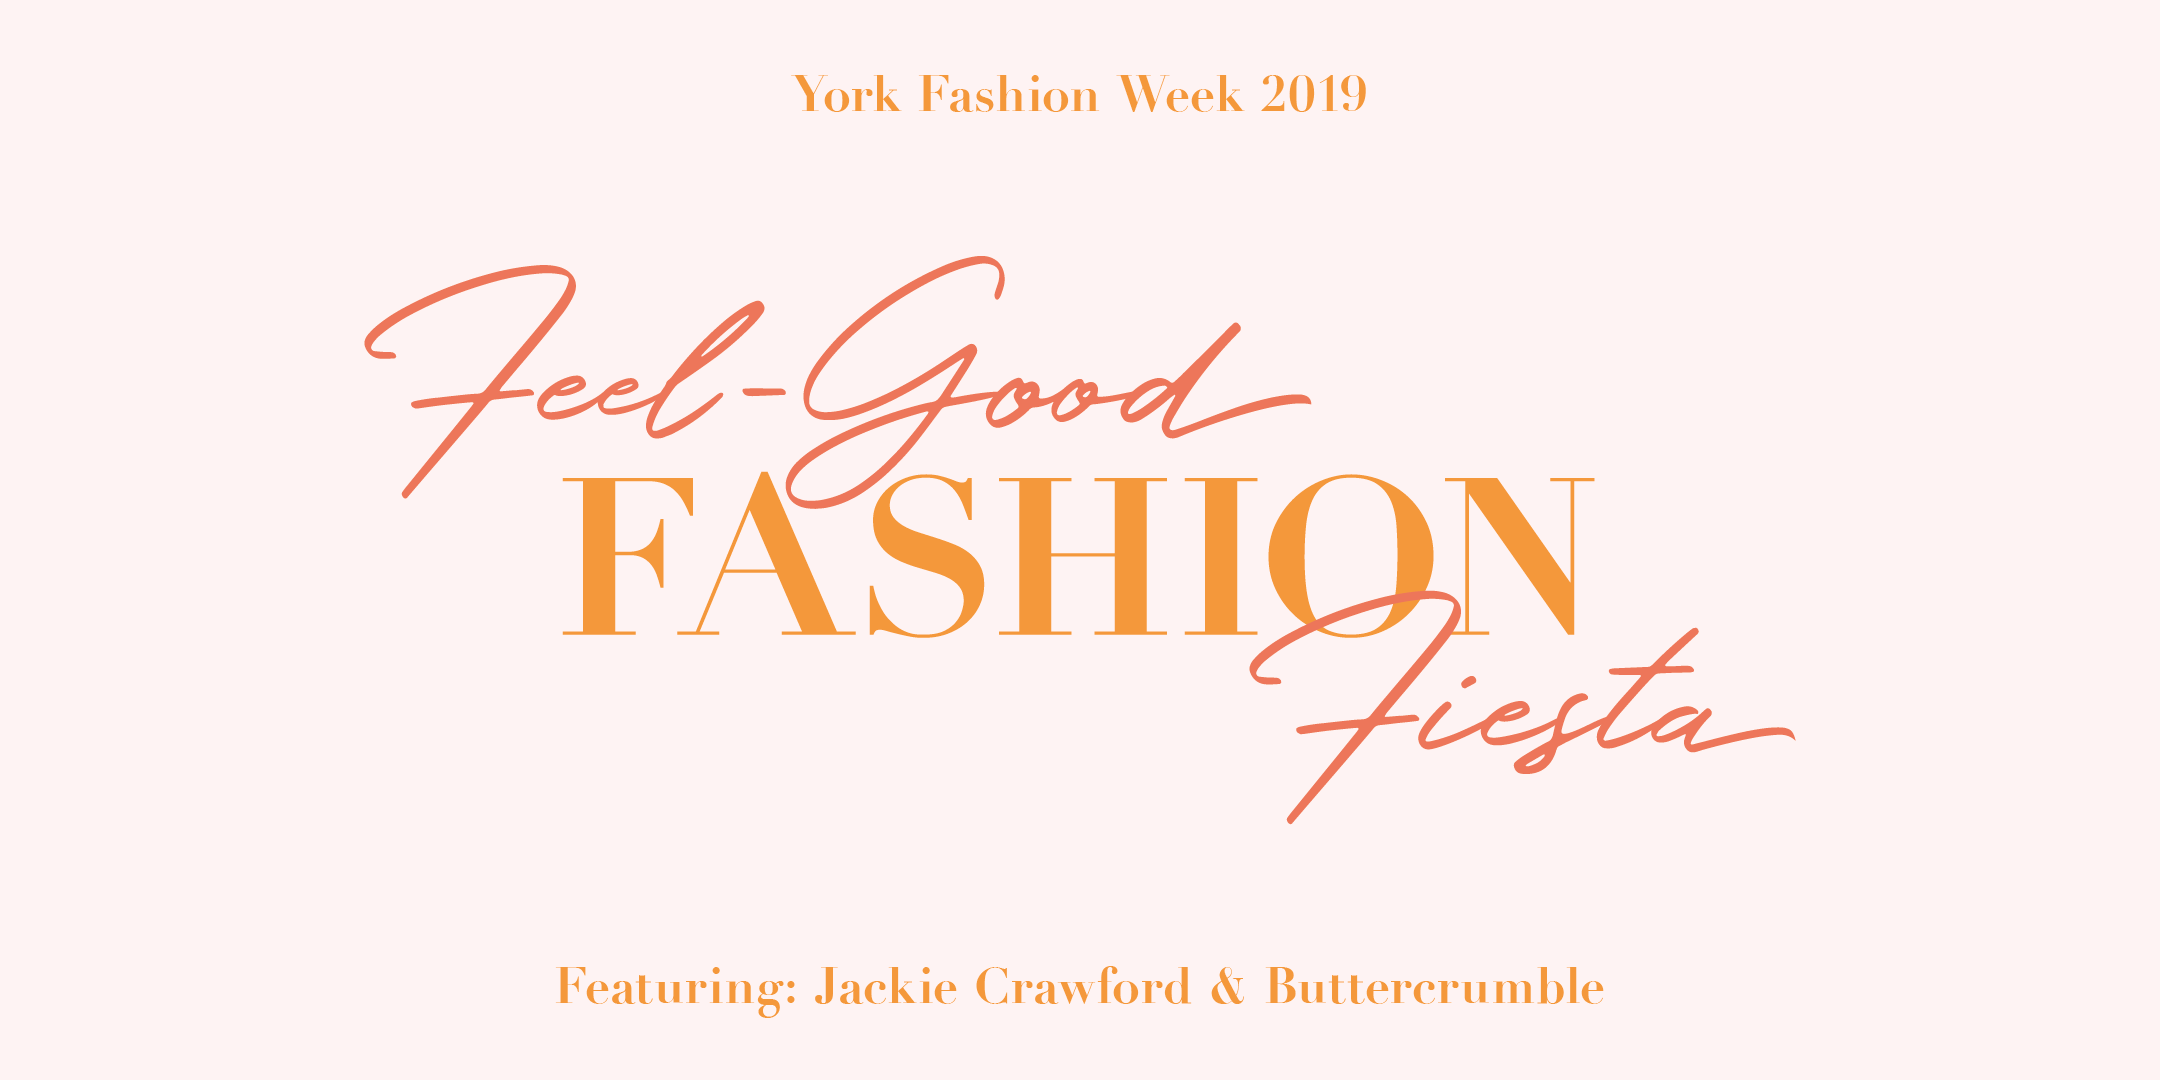 Feel-Good-Fashion-Fiesta-Eventbrite-Header.png